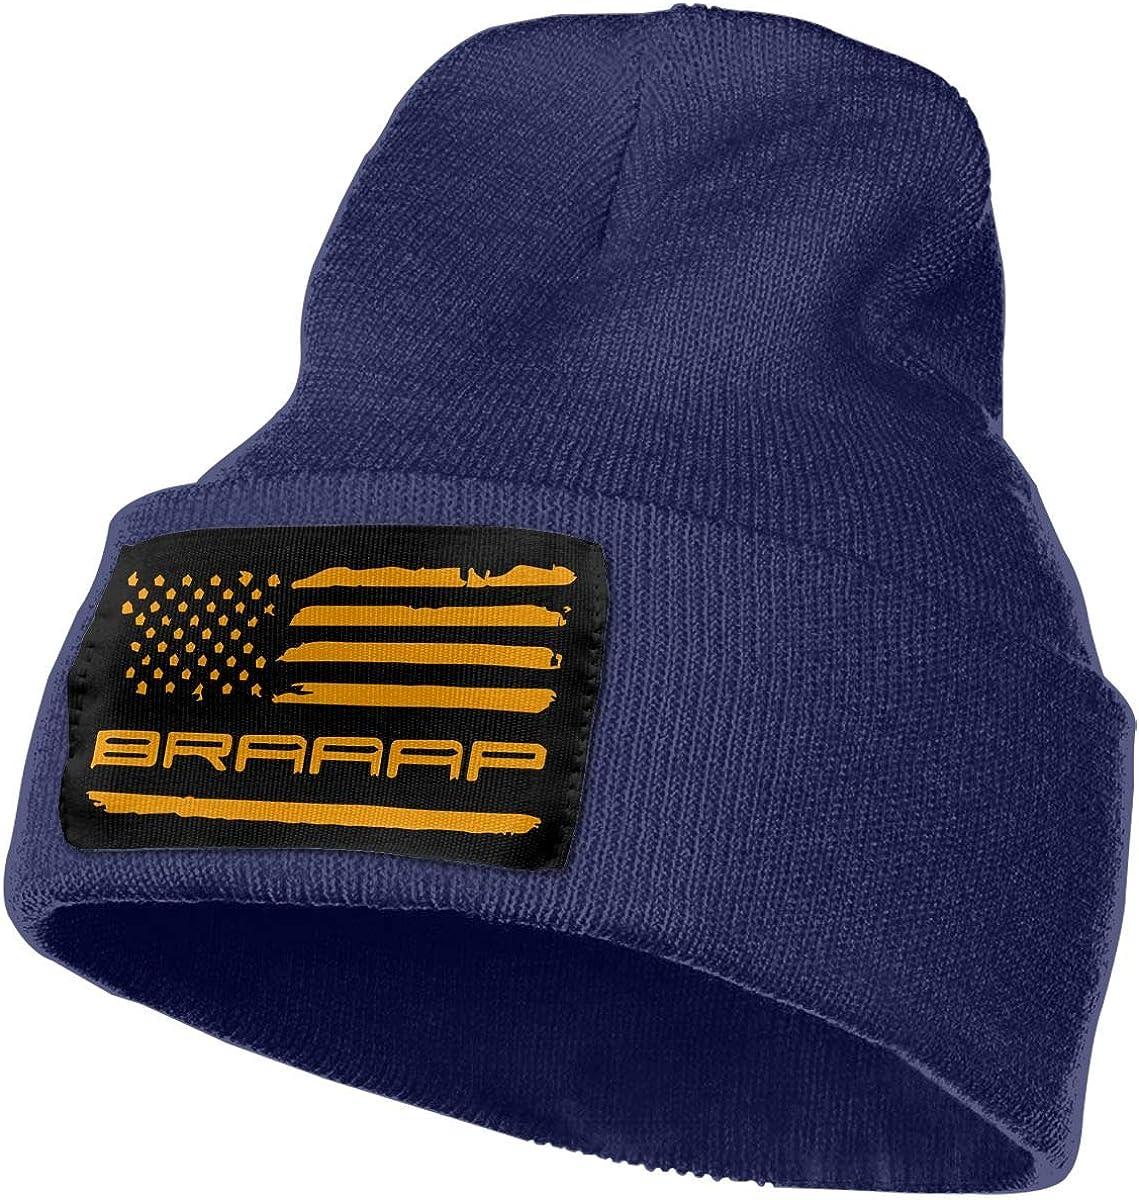 COLLJL-8 Unisex Braaap Motocross Dirt Bike American Flag Outdoor Warm Knit Beanies Hat Soft Winter Knit Caps